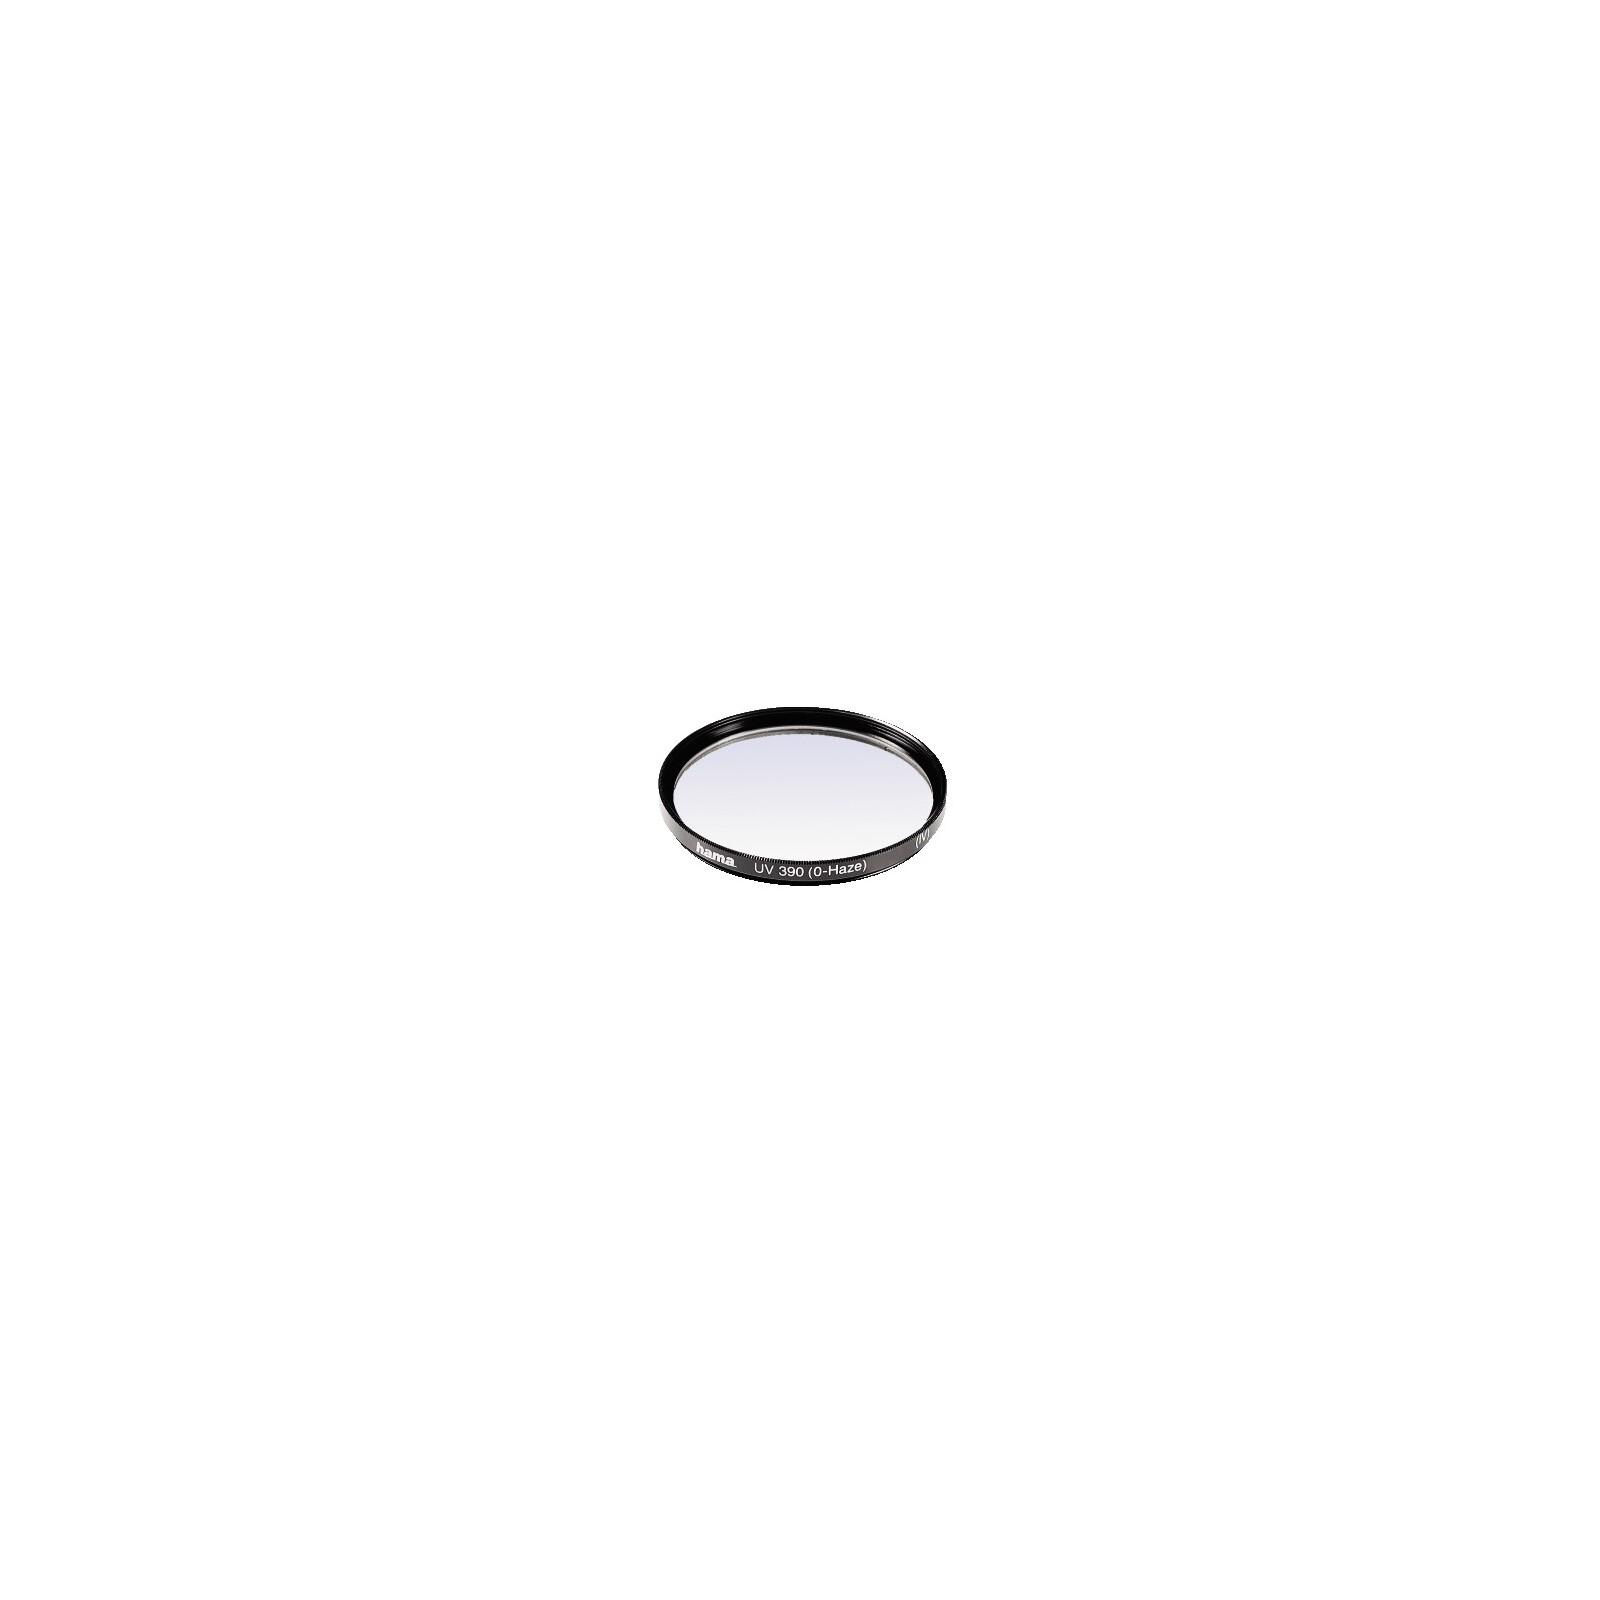 Hama 70162 UV ARC 62mm